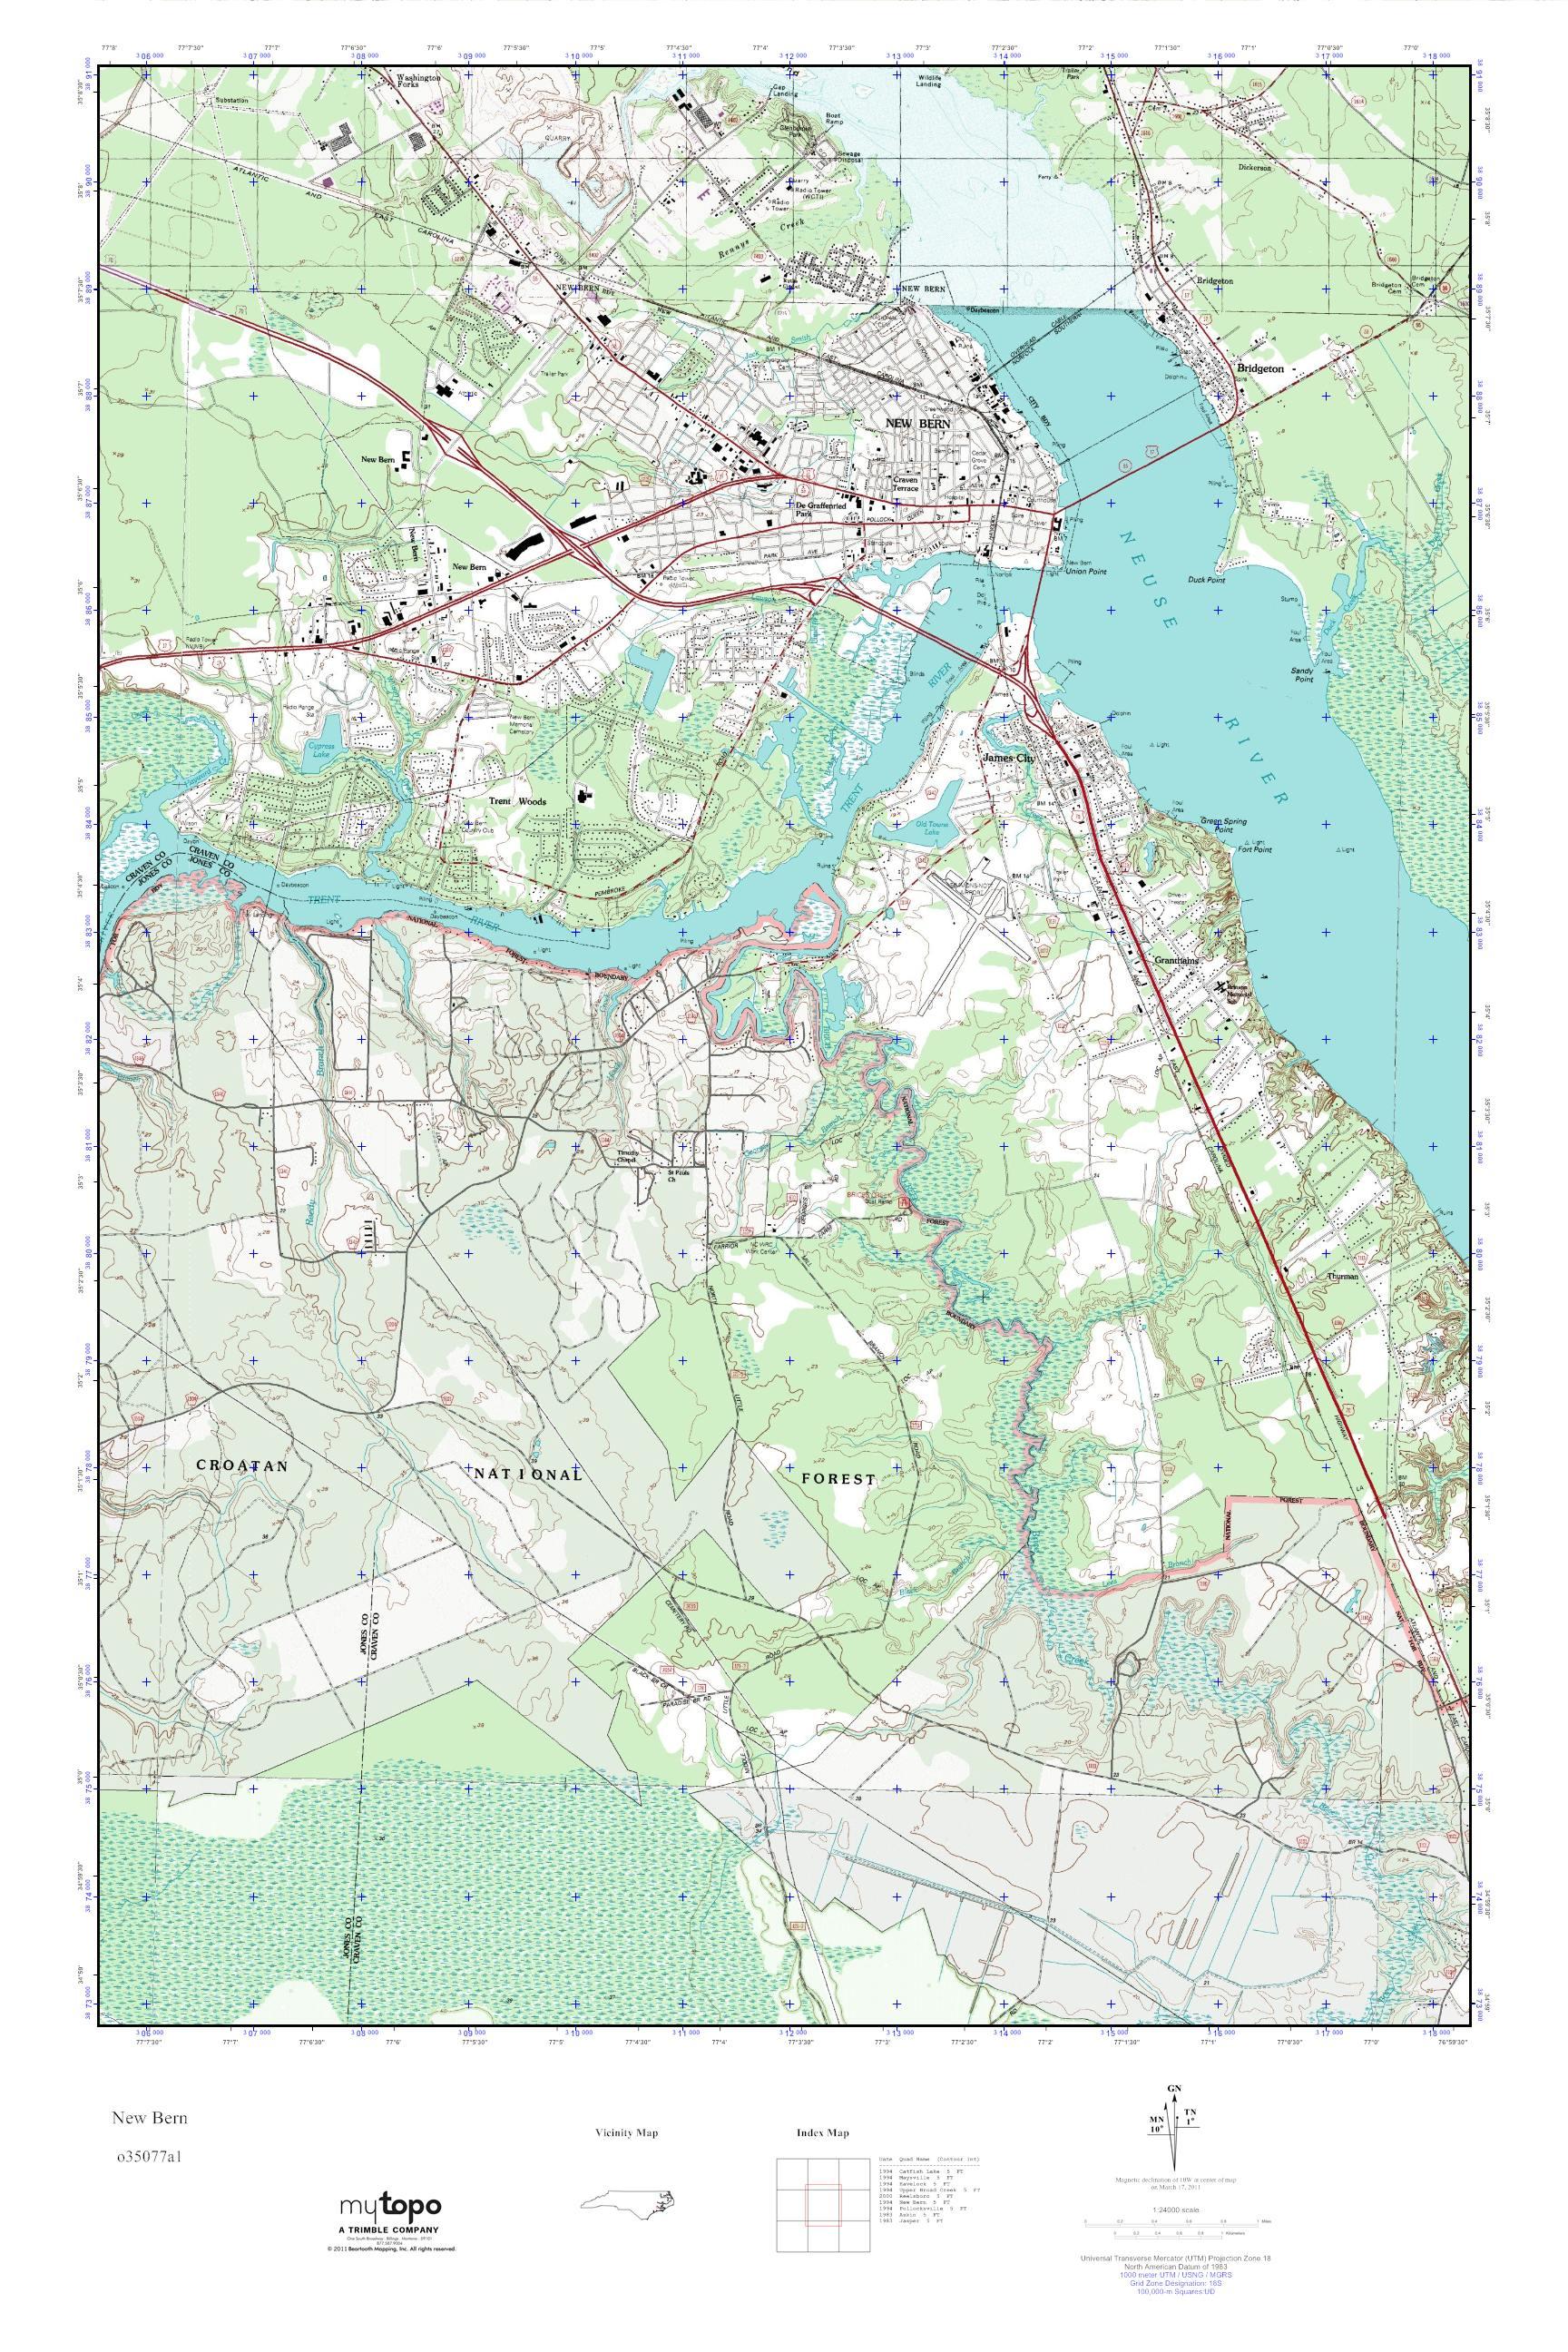 Mytopo New Bern North Carolina Usgs Quad Topo Map